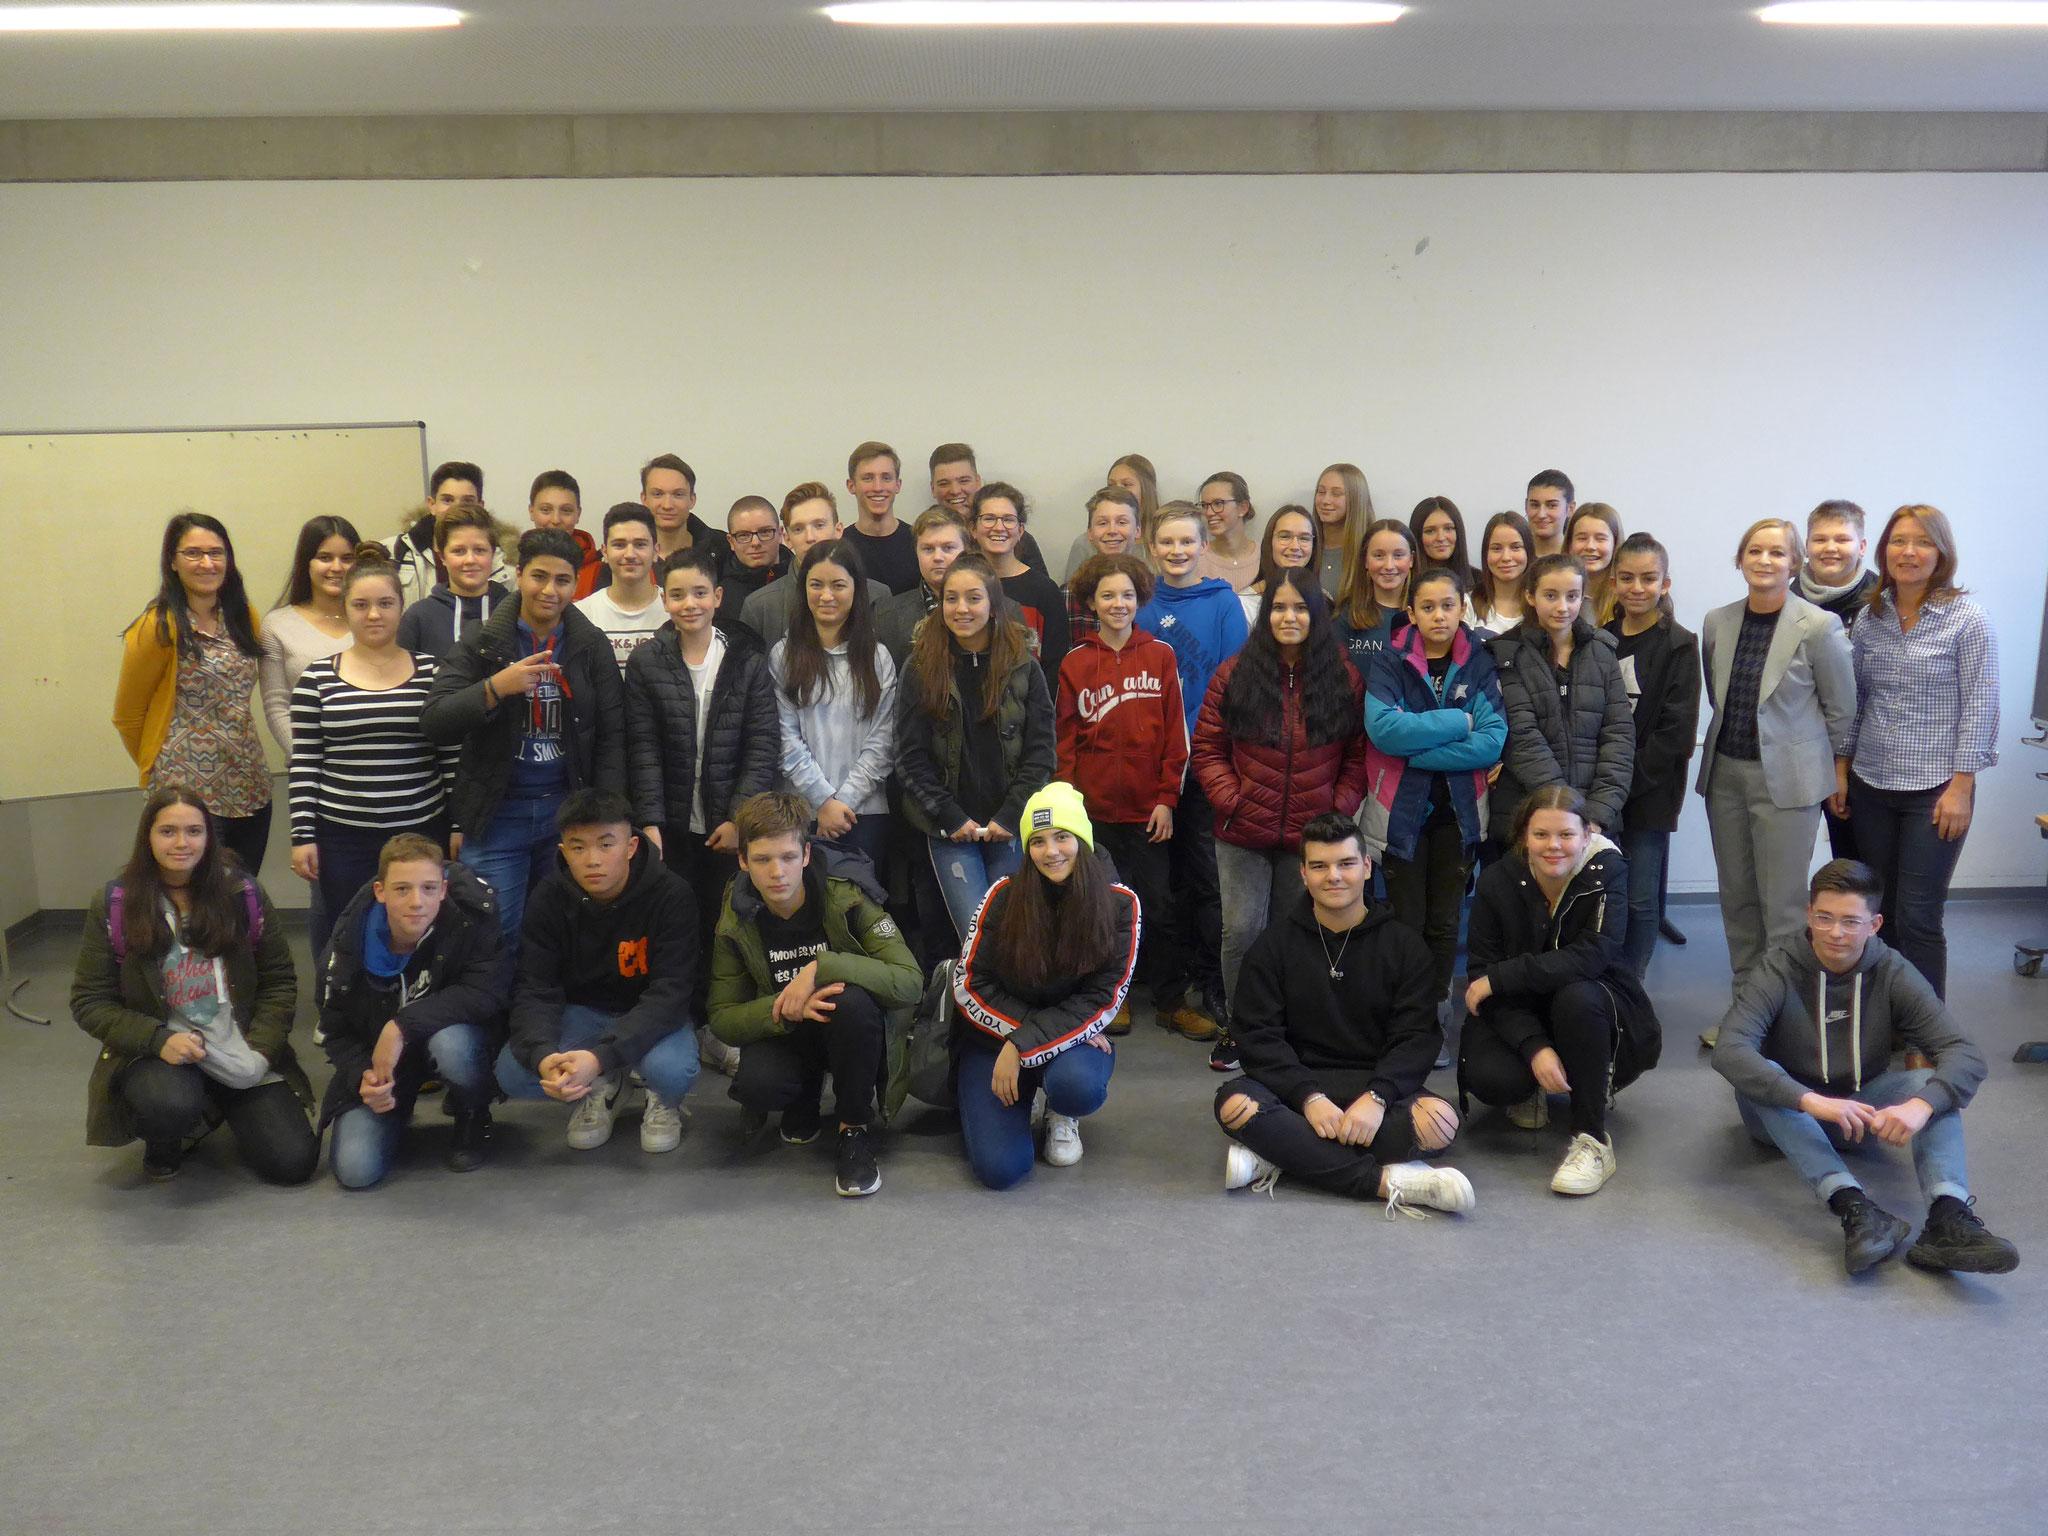 Teilnehmer des KommMit-Projekts 2019/2020